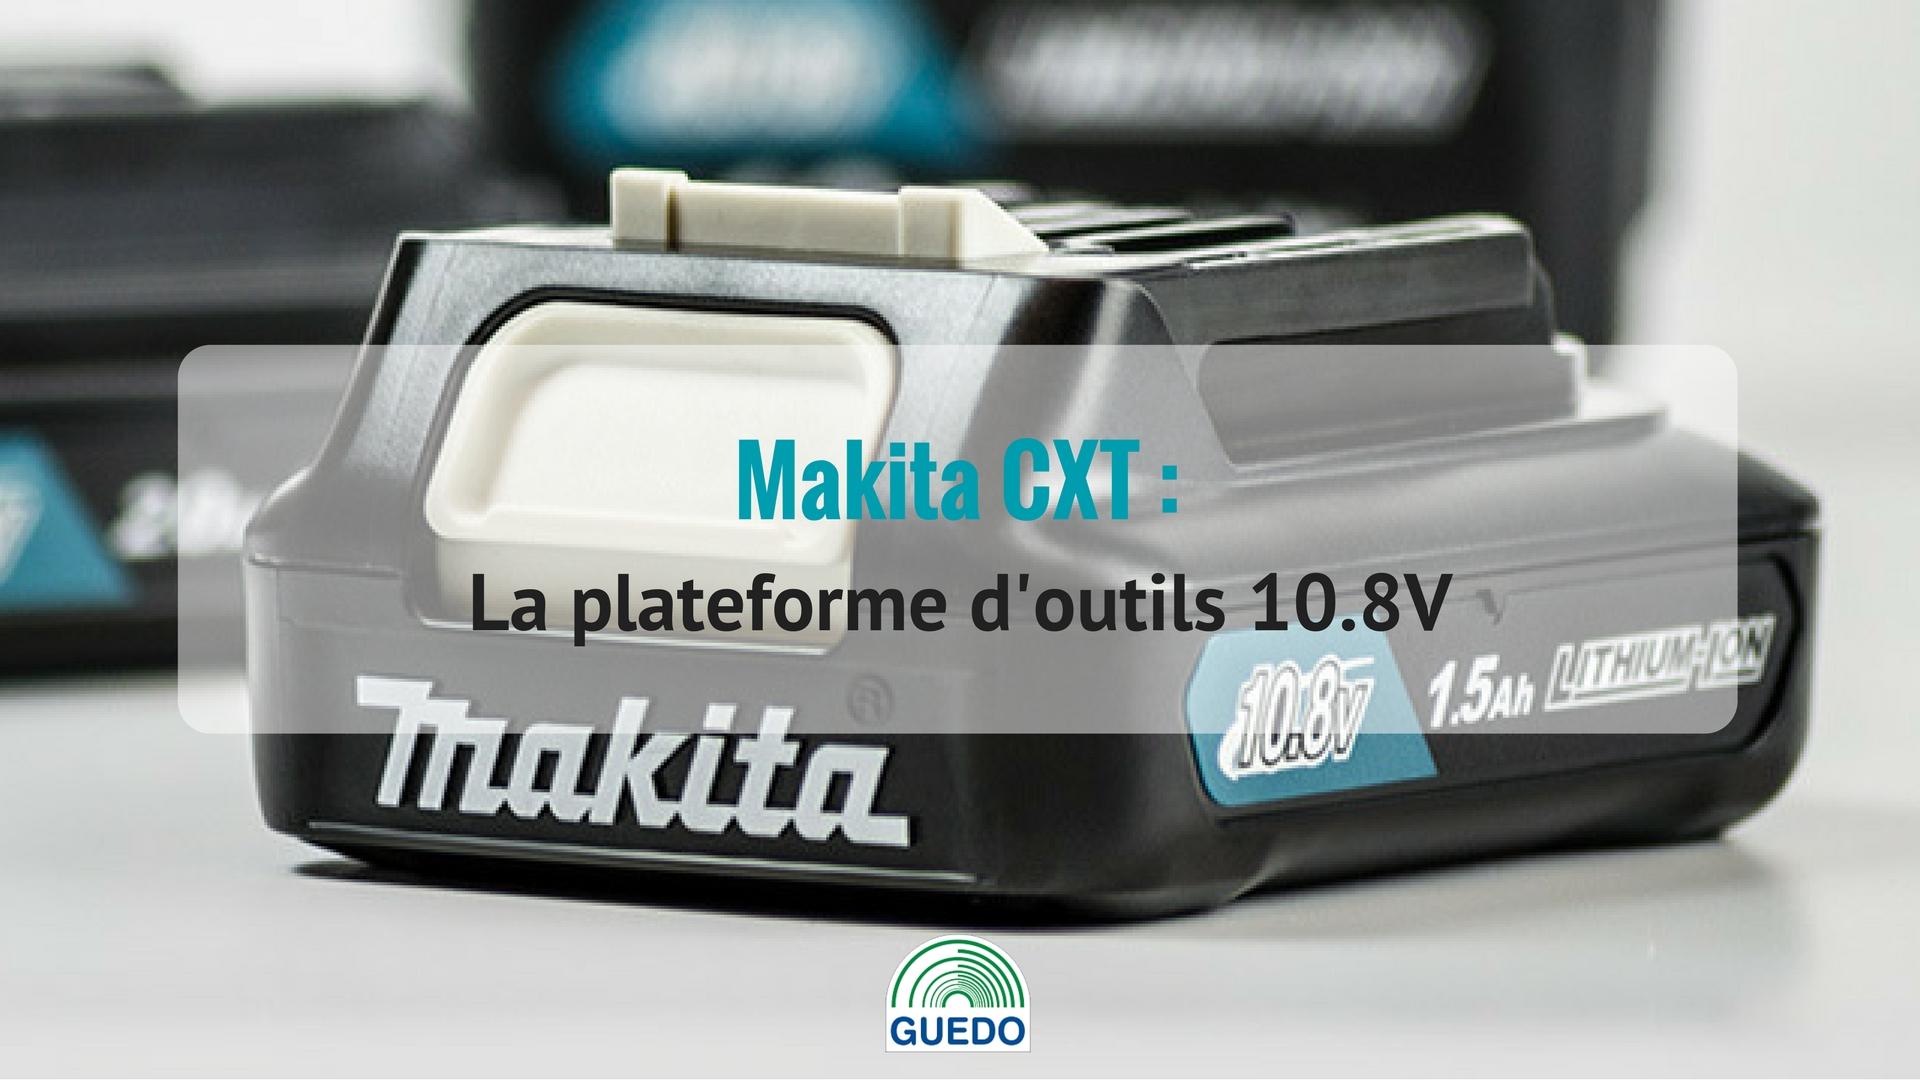 PLaterforme d'outils 10.8V Makita